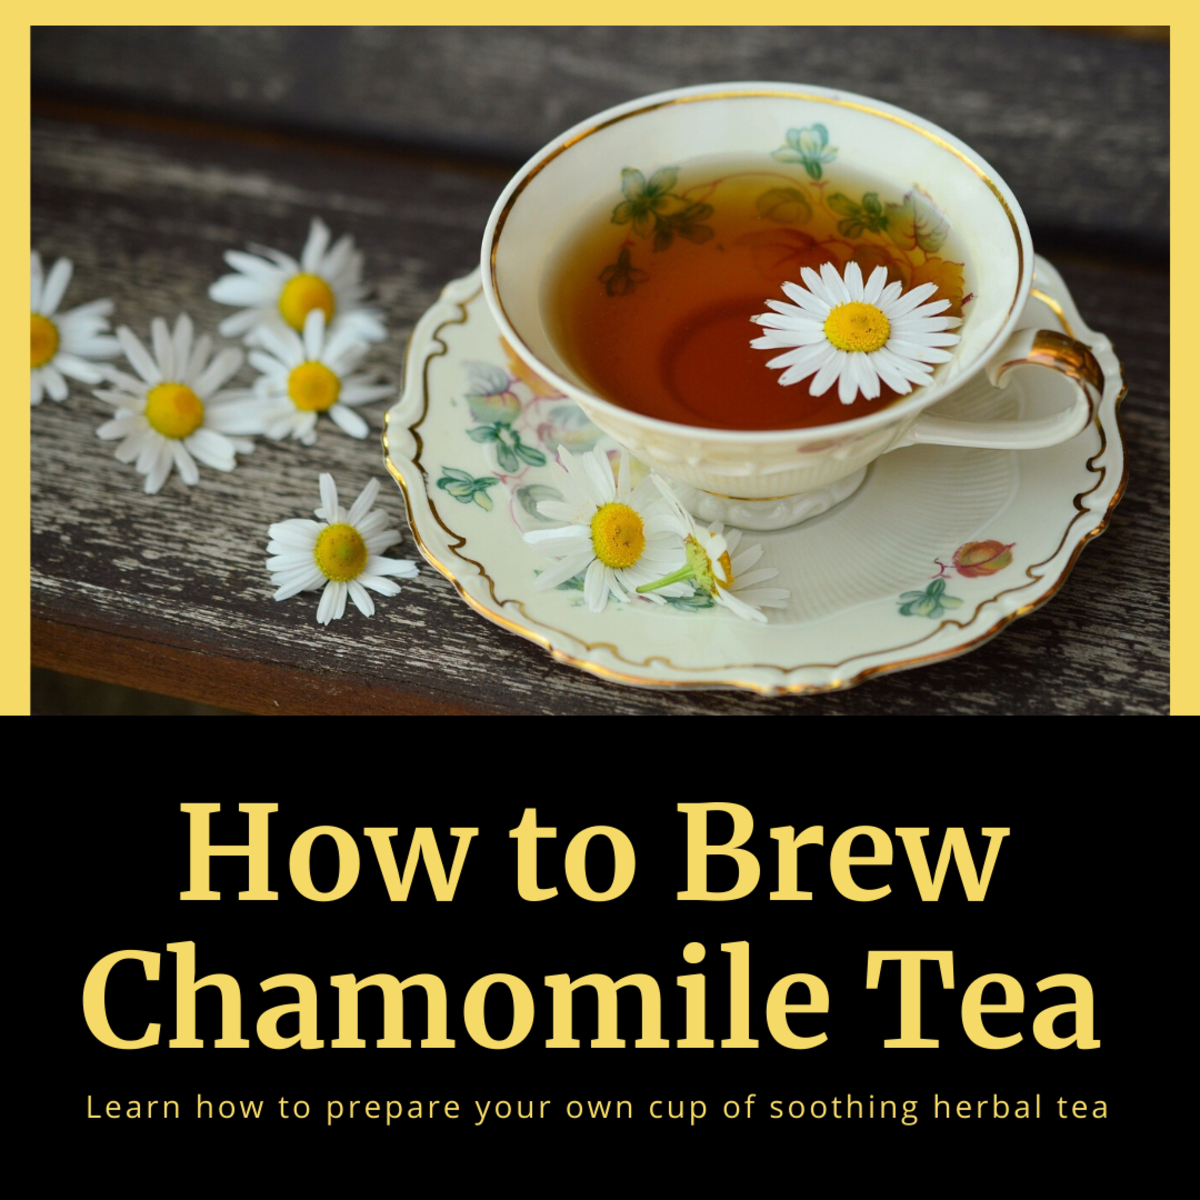 How to Prepare and Brew Chamomile Tea